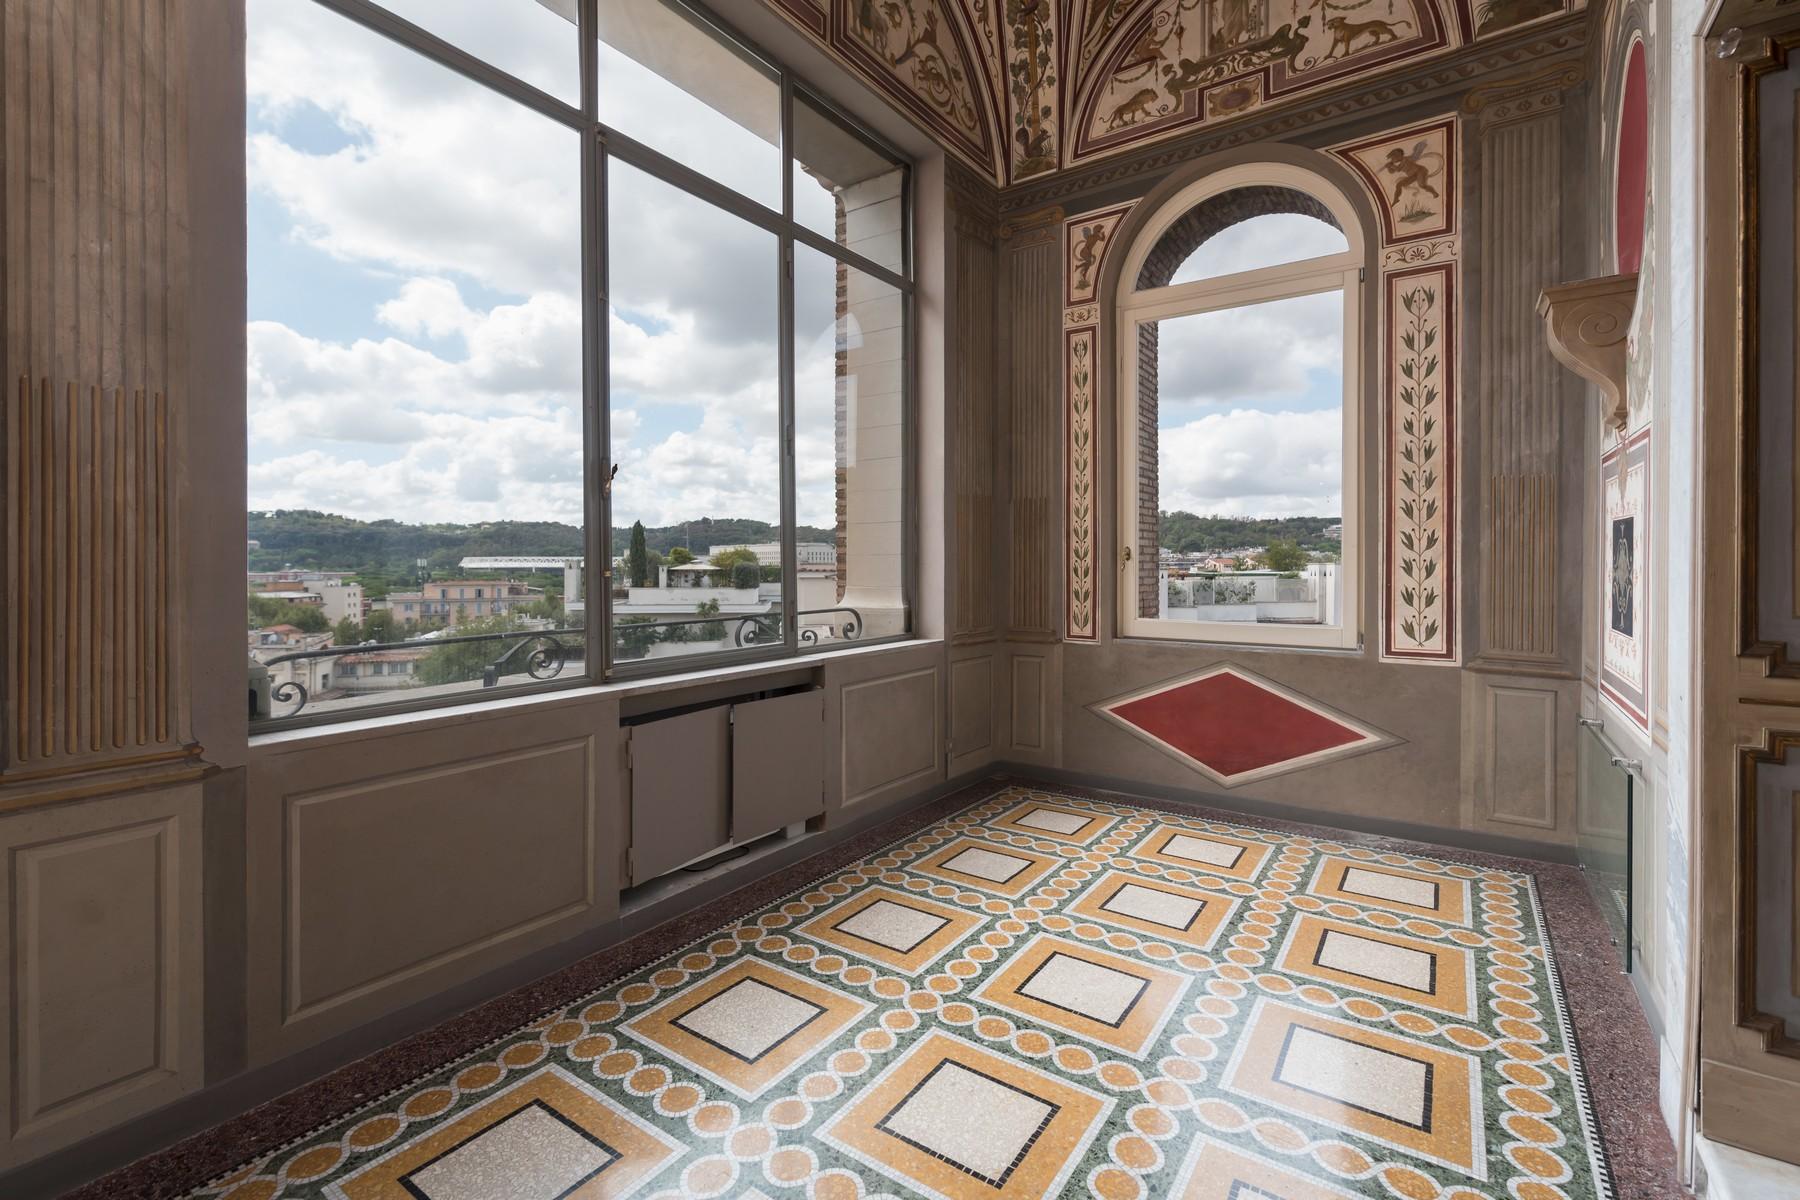 Appartamento in Vendita a Roma via flaminia